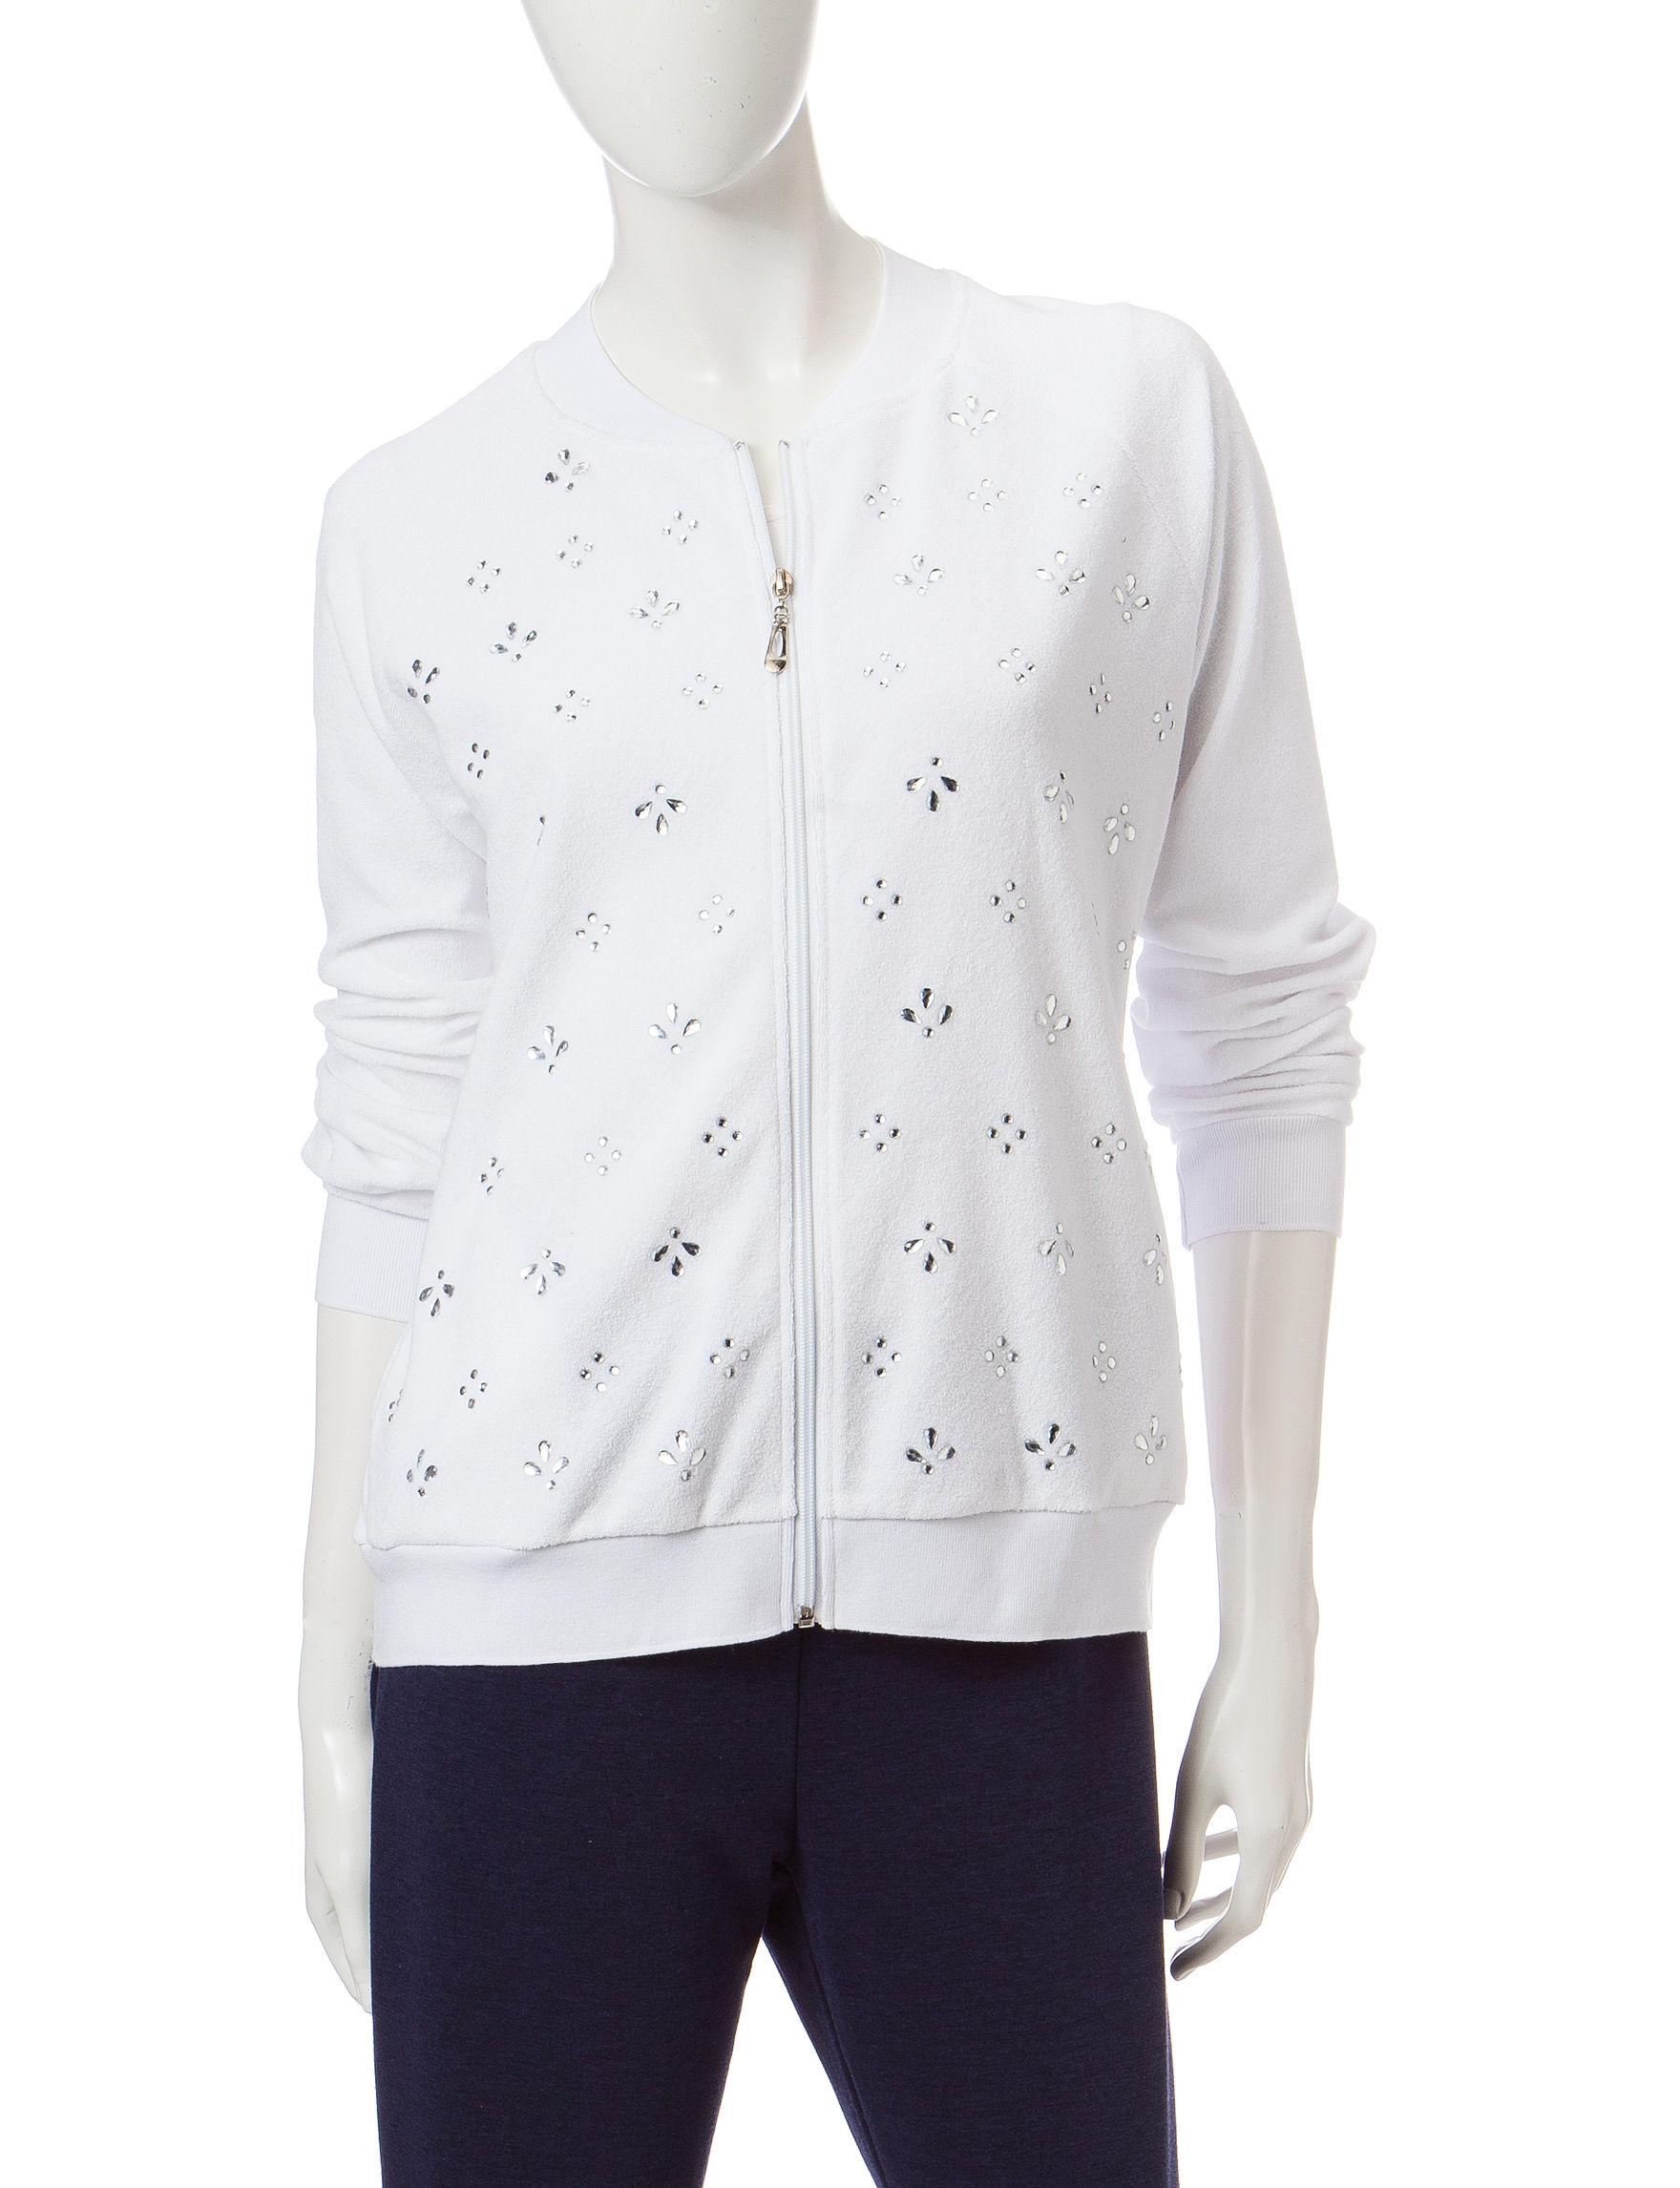 Cathy Daniels White Lightweight Jackets & Blazers